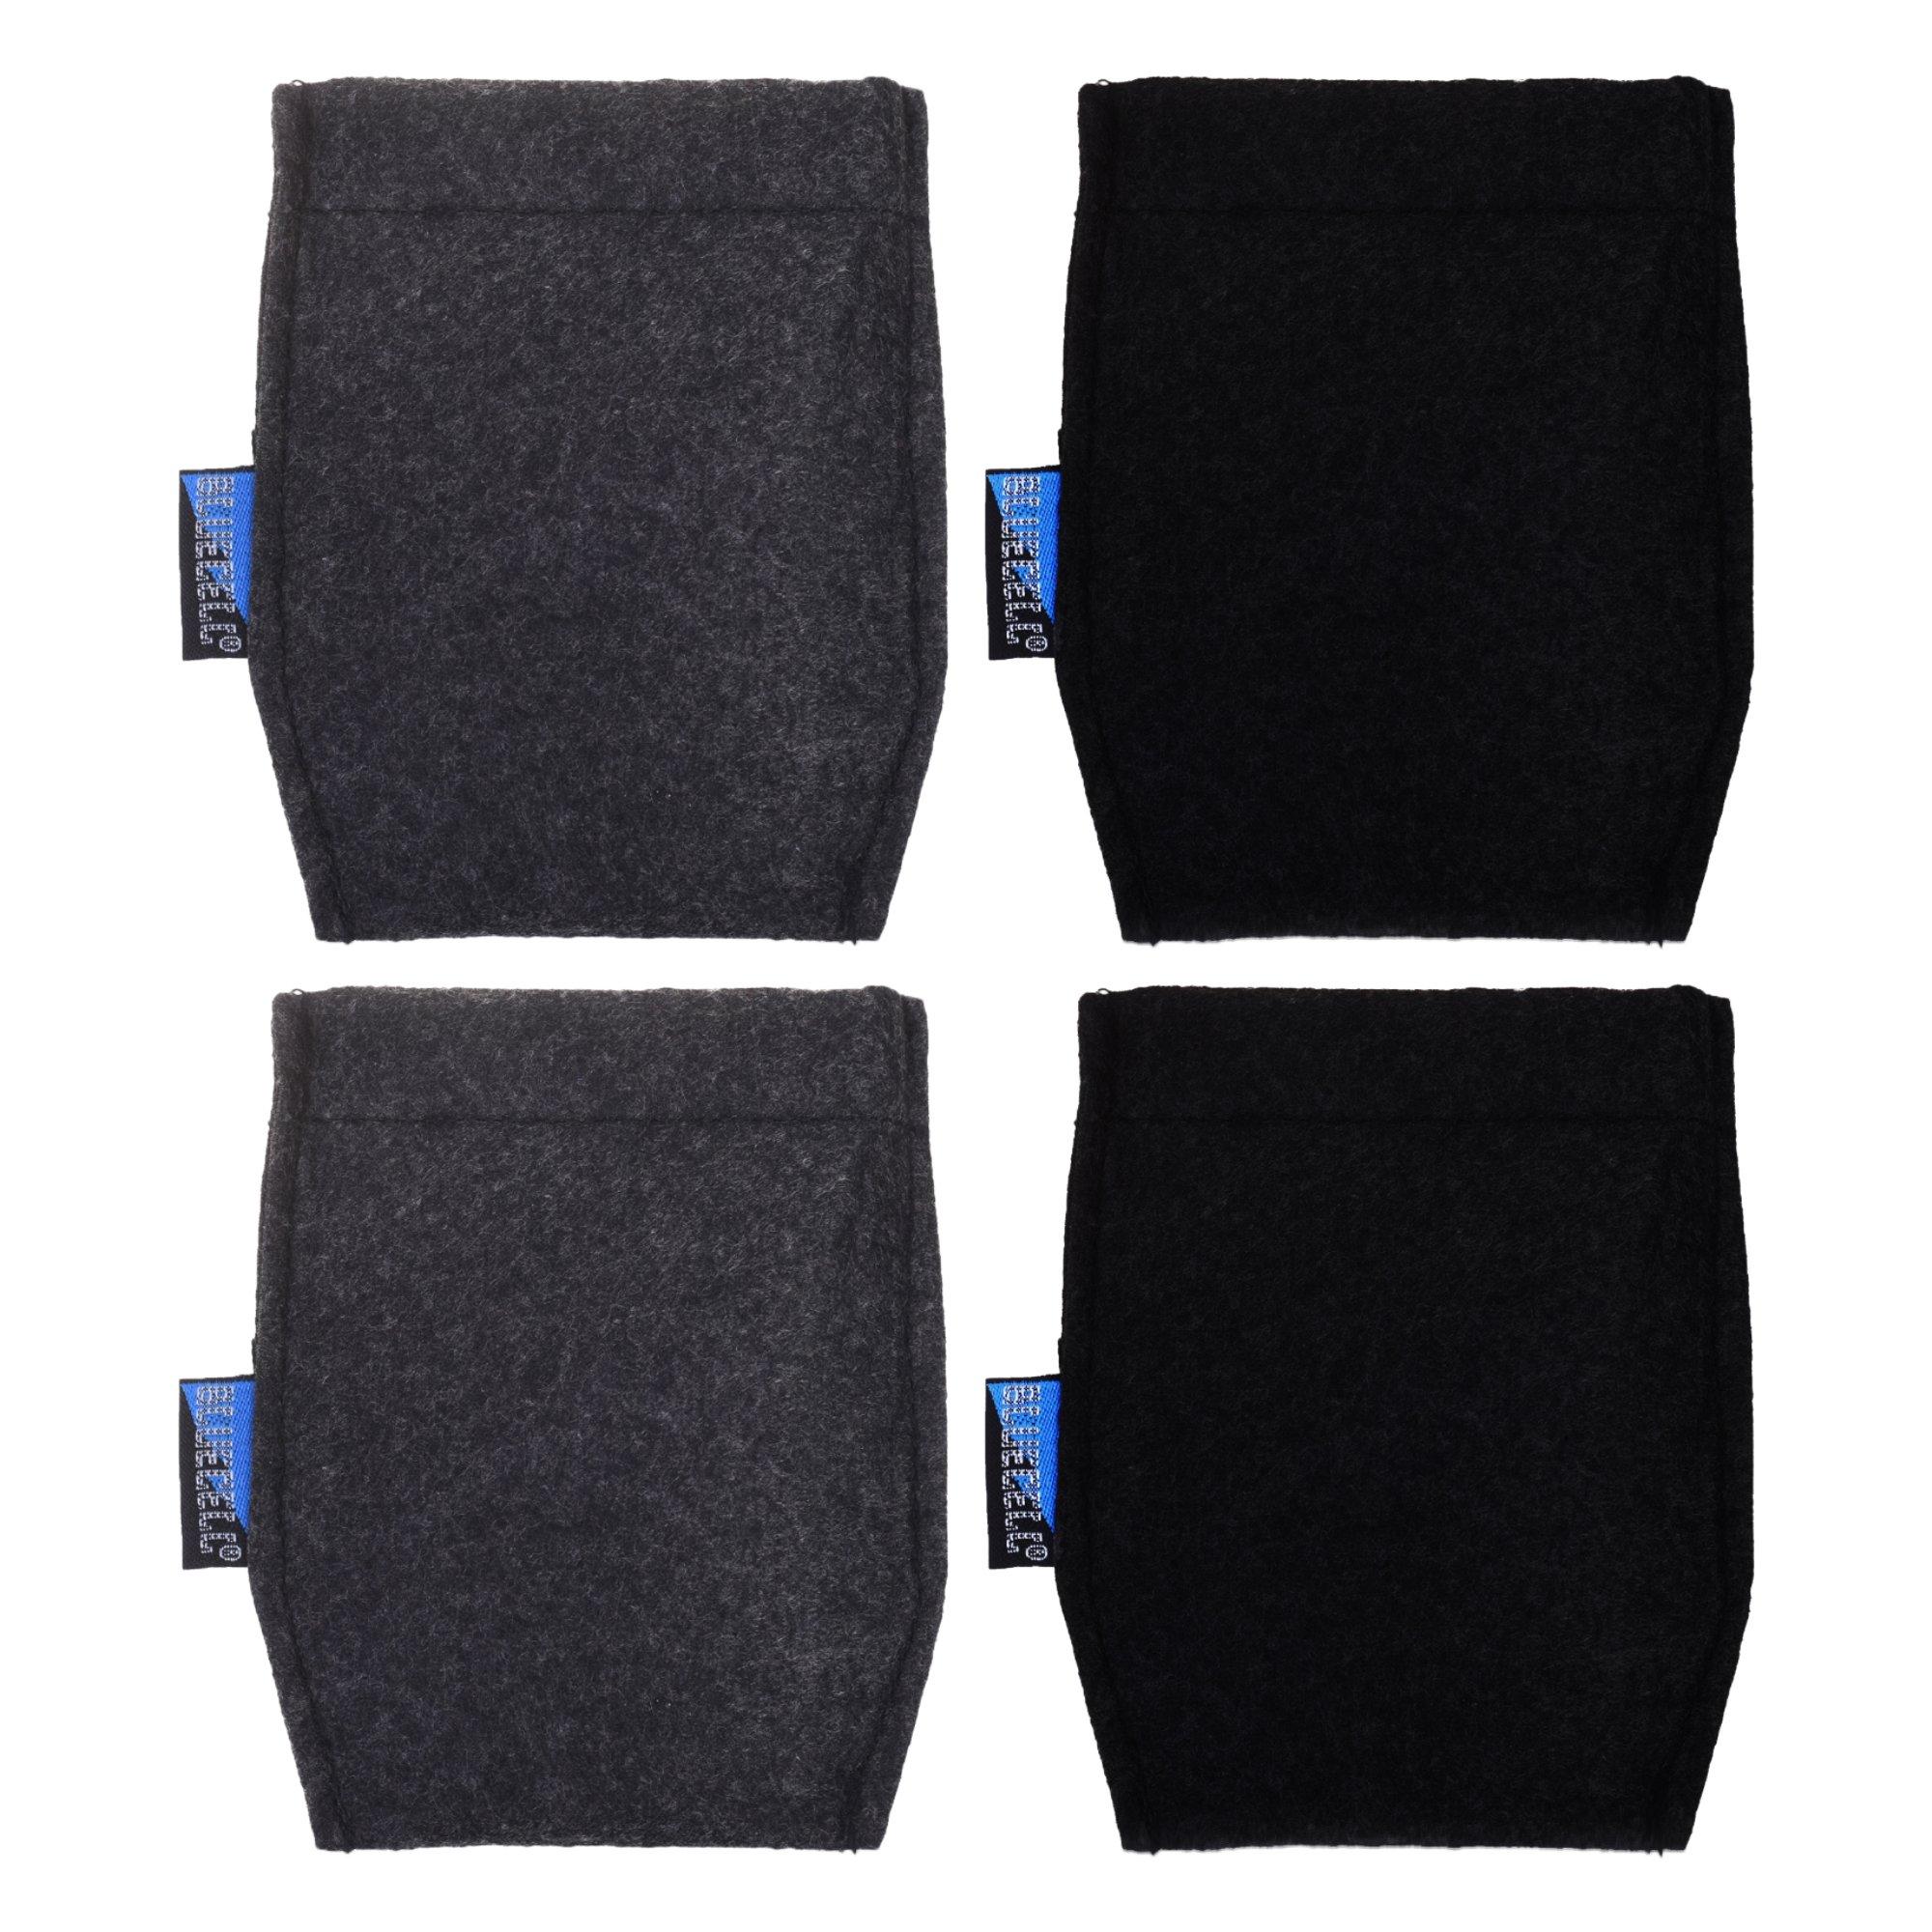 BCP Pocket Square Holder Suits